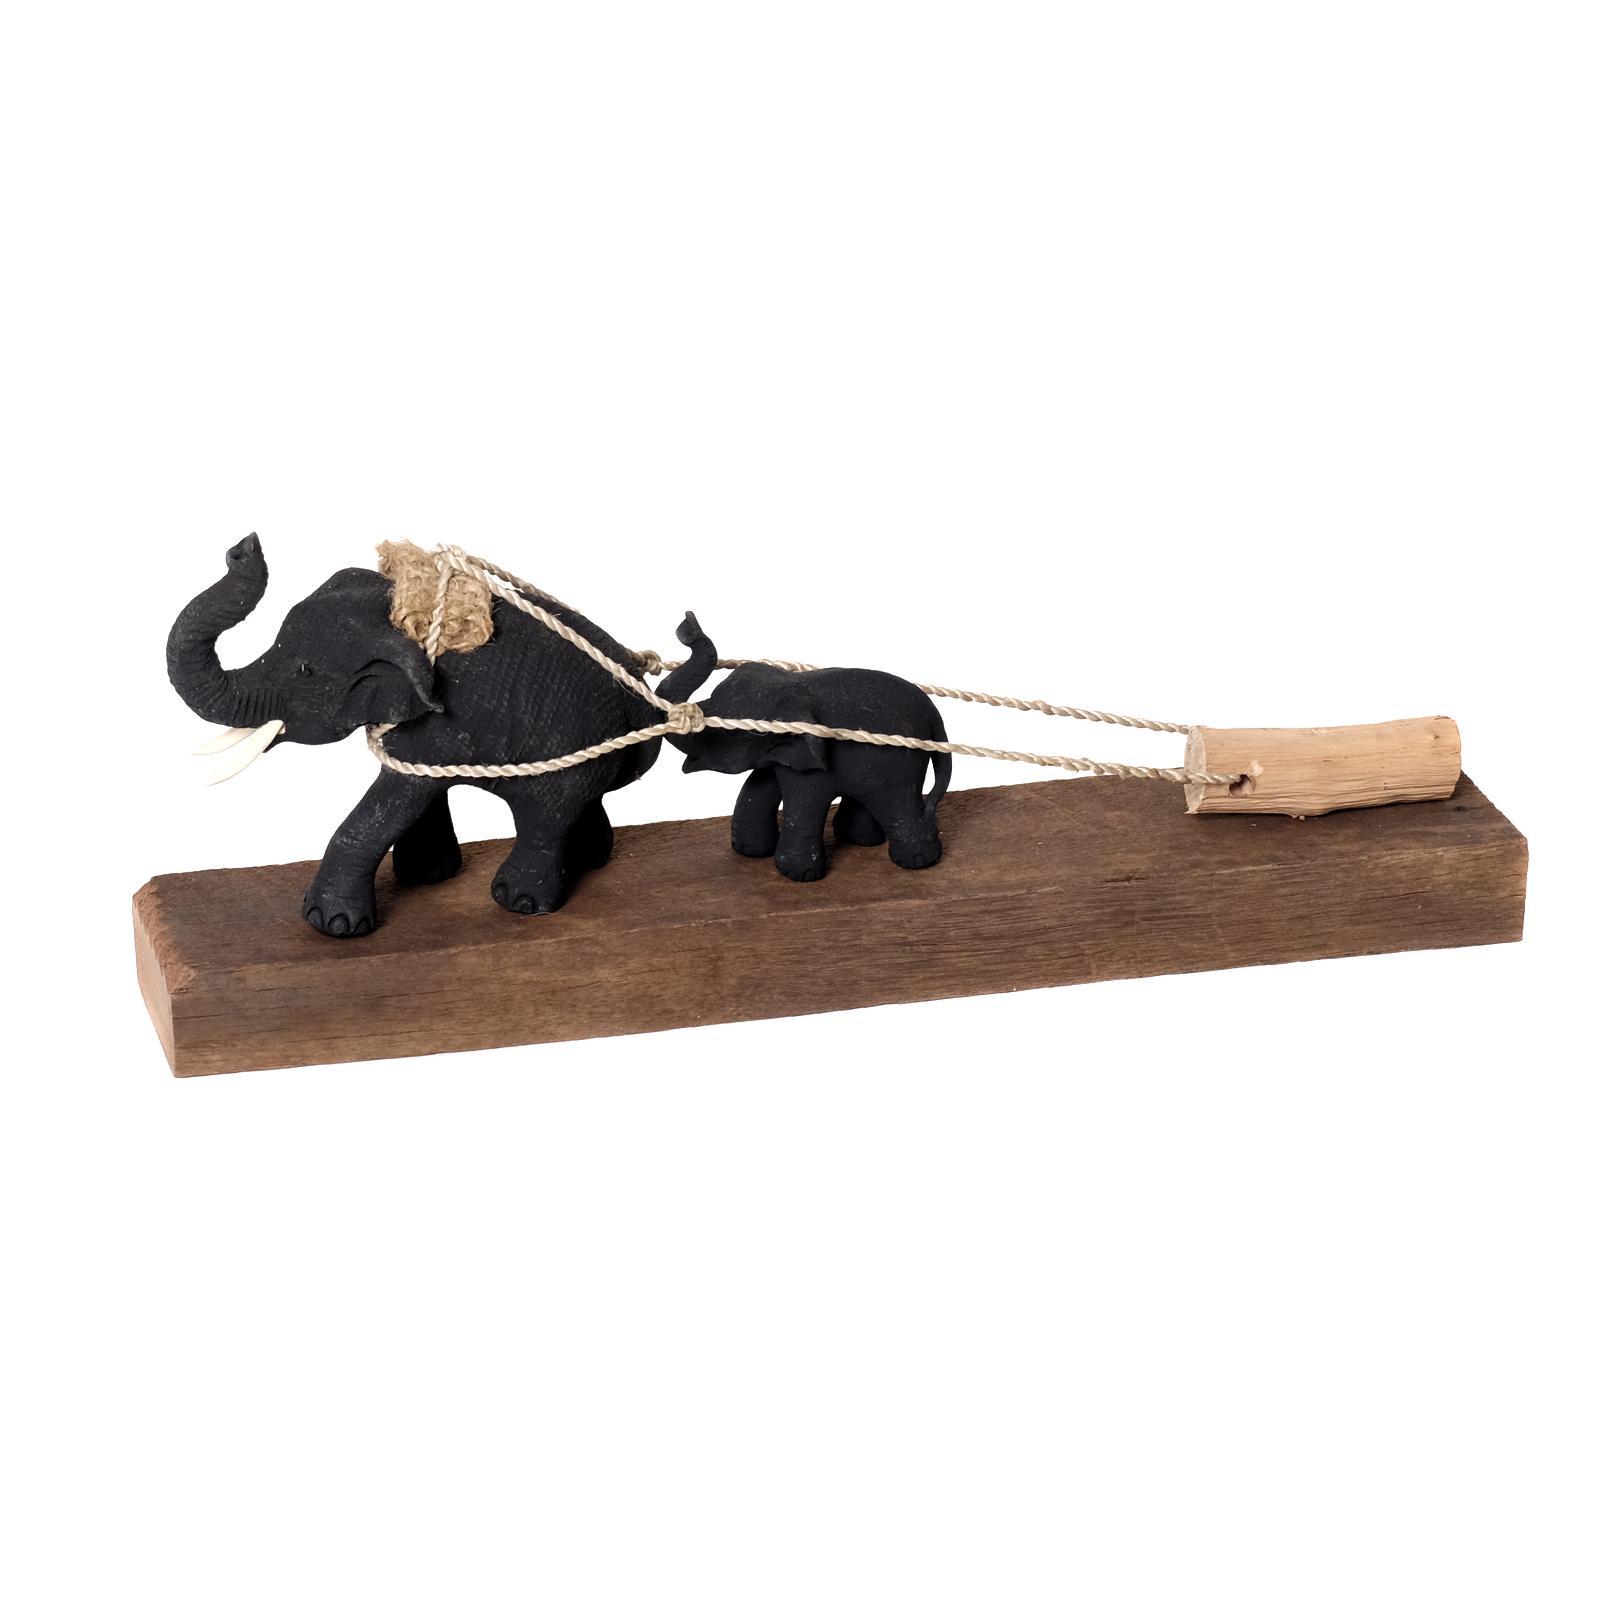 figur arbeitselefant elefant aus holz deko gro skulptur statue asien afrika neu ebay. Black Bedroom Furniture Sets. Home Design Ideas